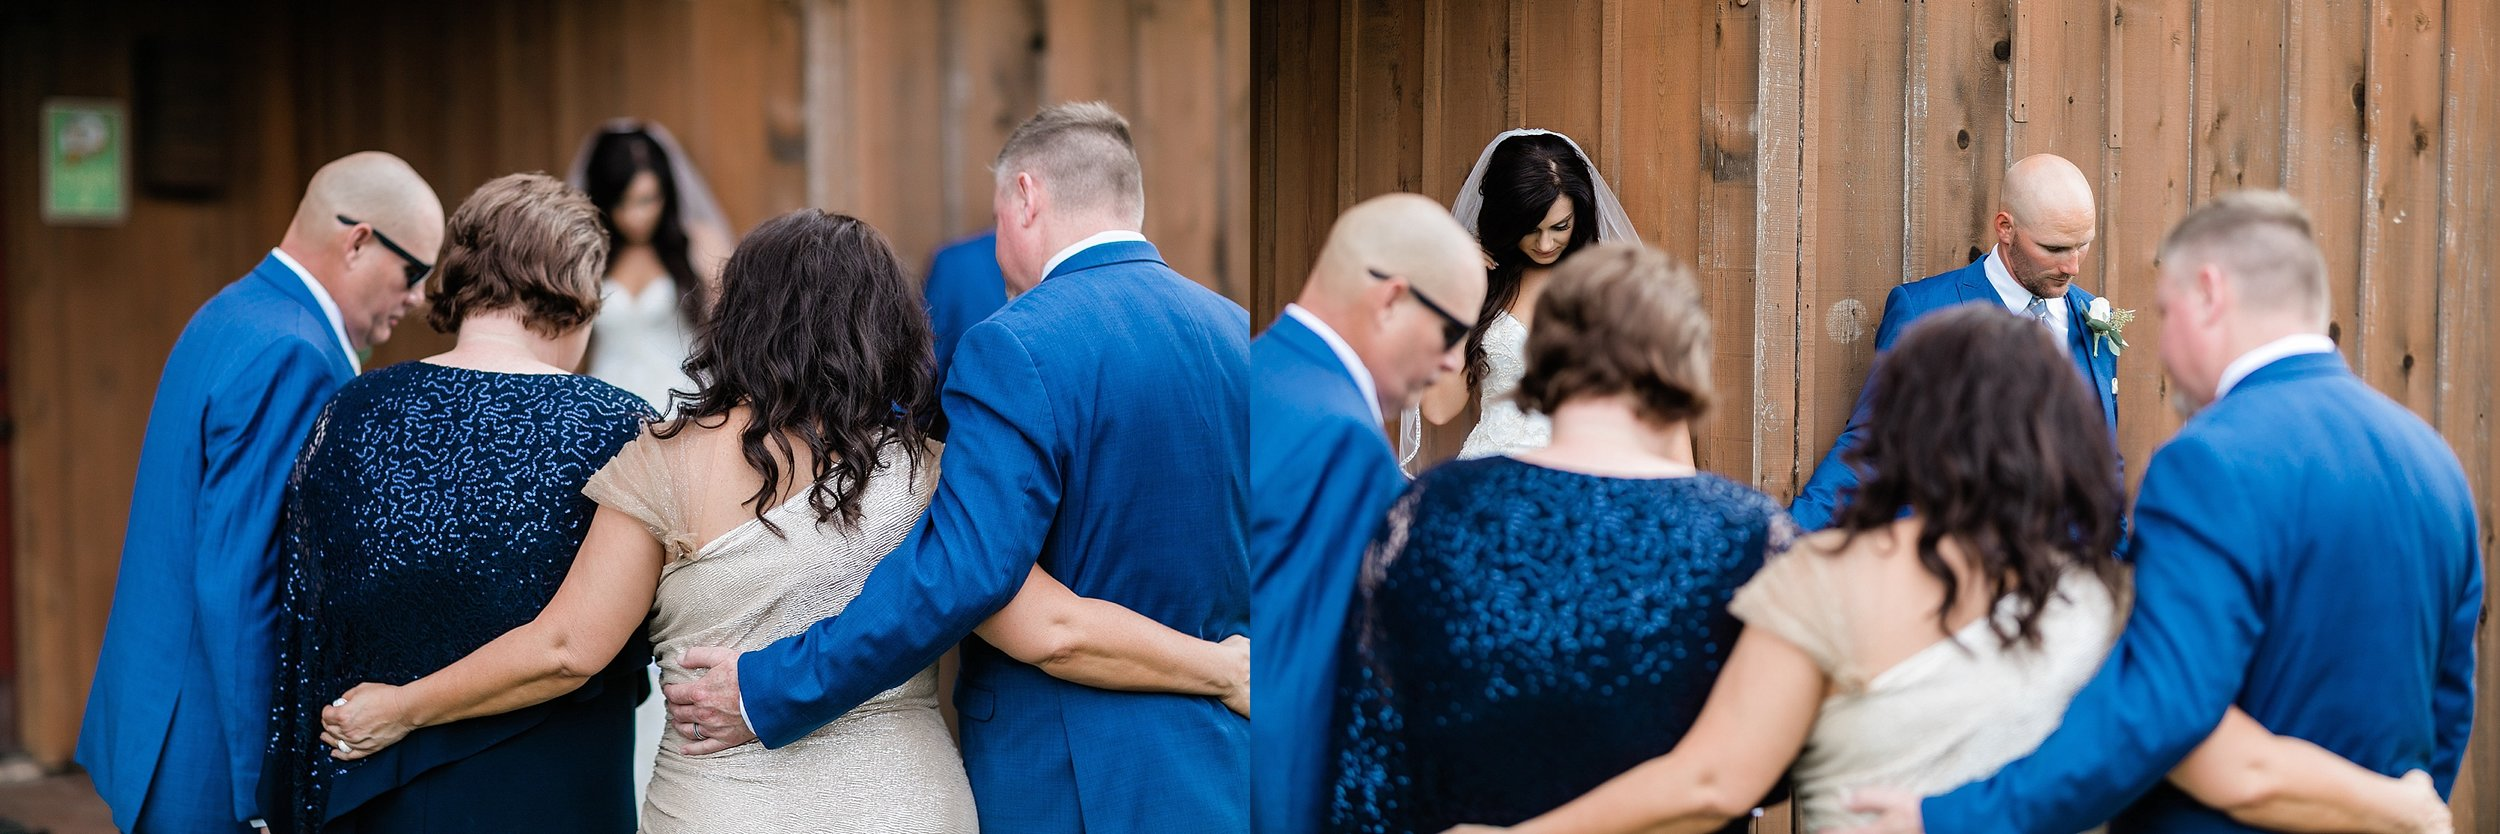 bailey-and-carl-coyote-ranch-resort-wedding-photographer-wichita-falls-texas-destination-wedding-0012.jpg